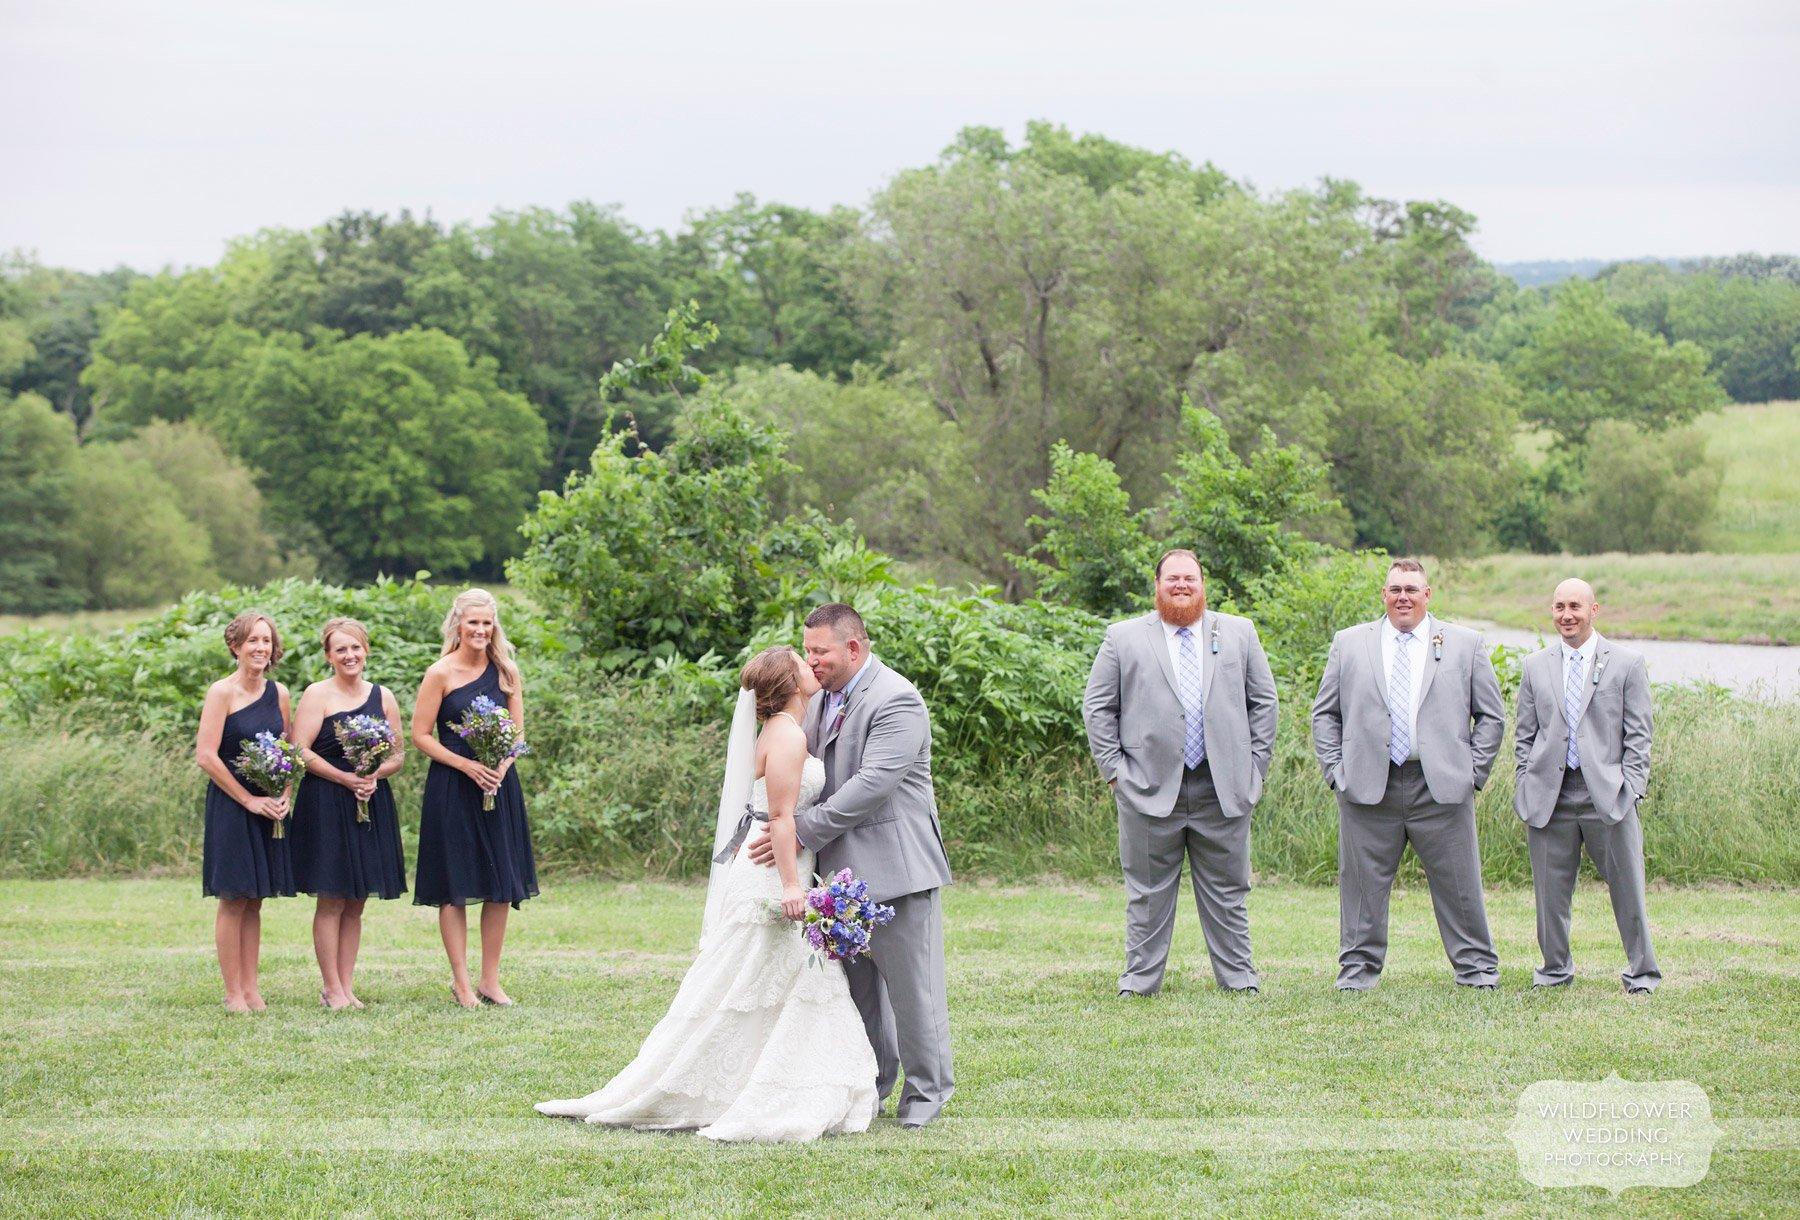 blue-bell-barn-wedding-reception-02